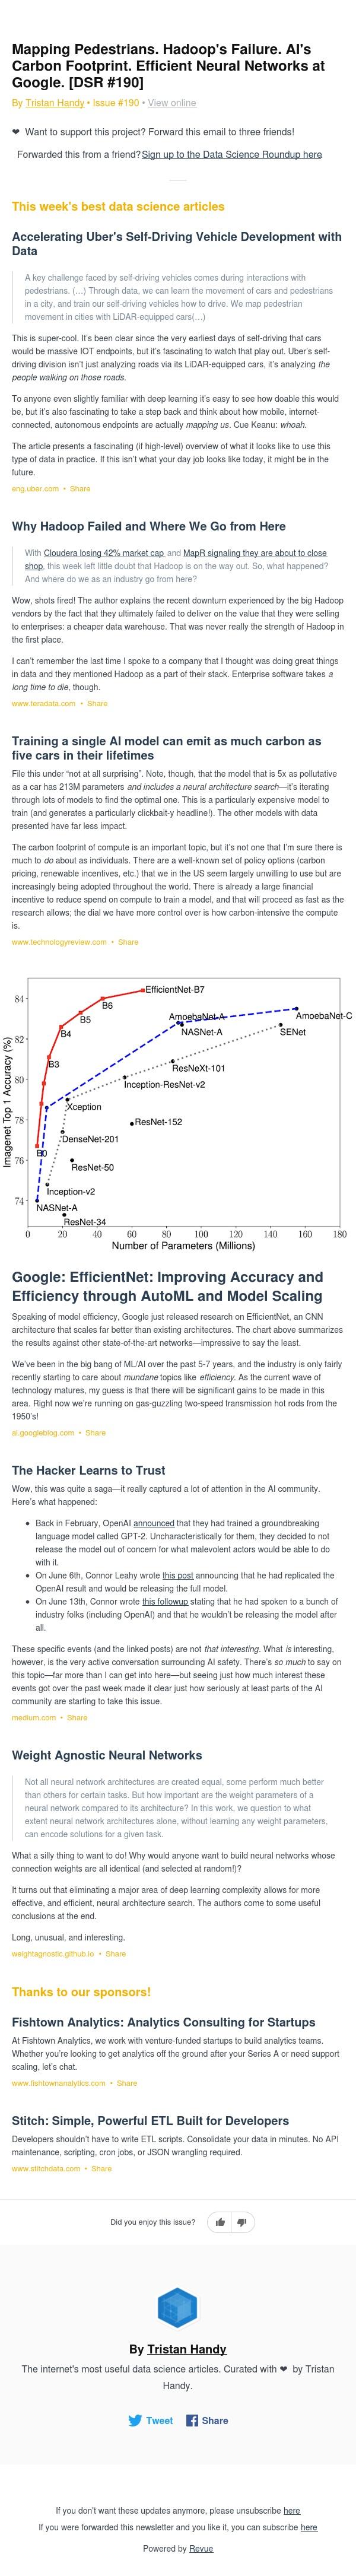 Mapping Pedestrians. Hadoop's Failure. AI's Carbon Footprint. Efficient Neural Networks at Google. [DSR #190]